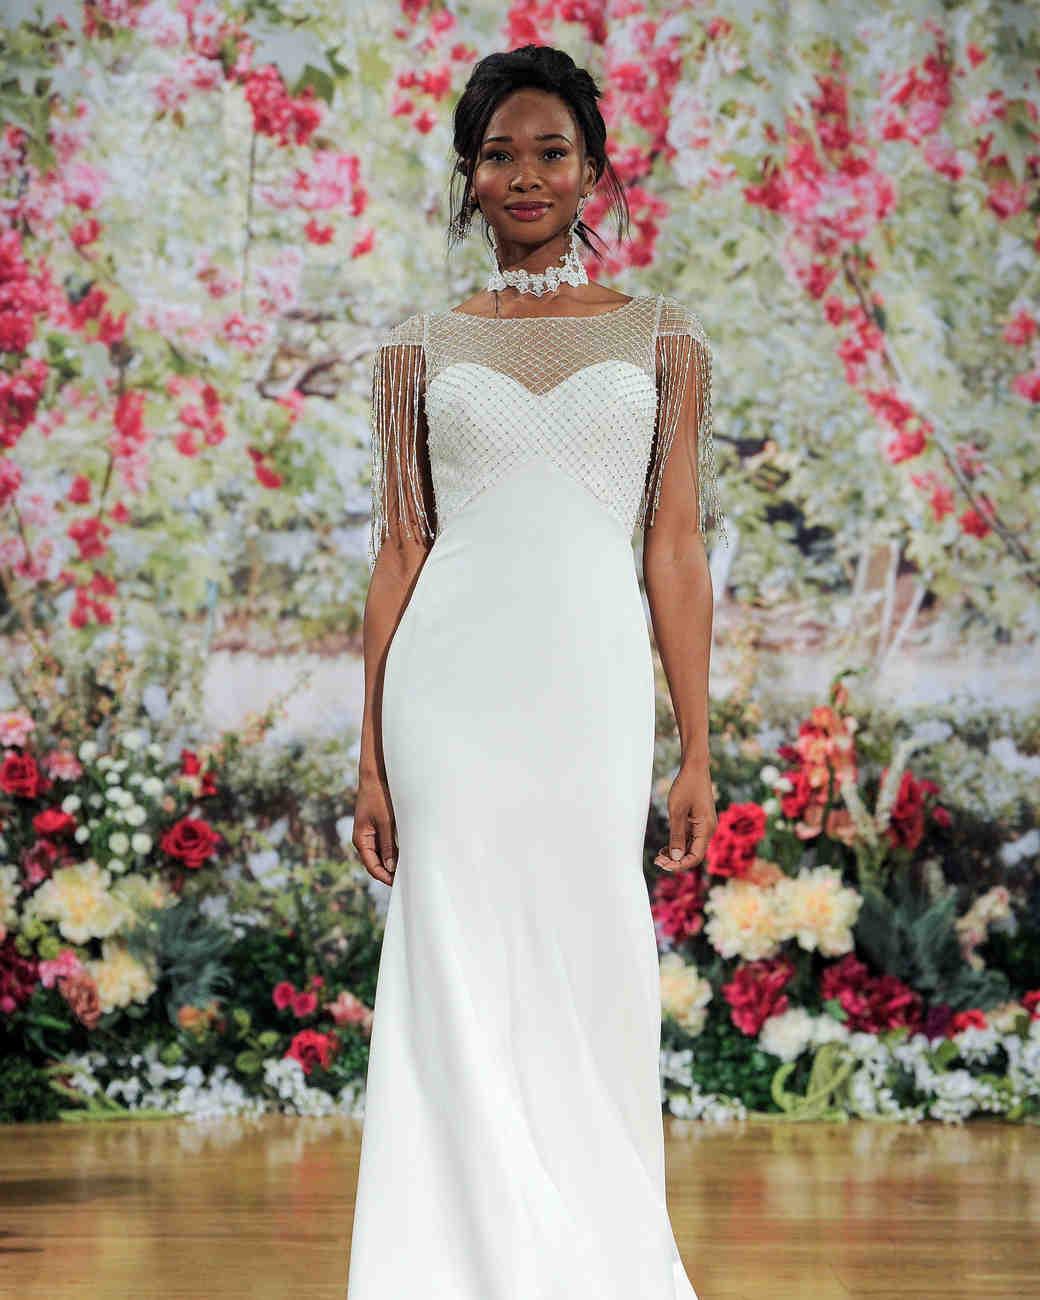 Sottero and Midgley Fall 2017 Wedding Dress with Fringe Sleeves